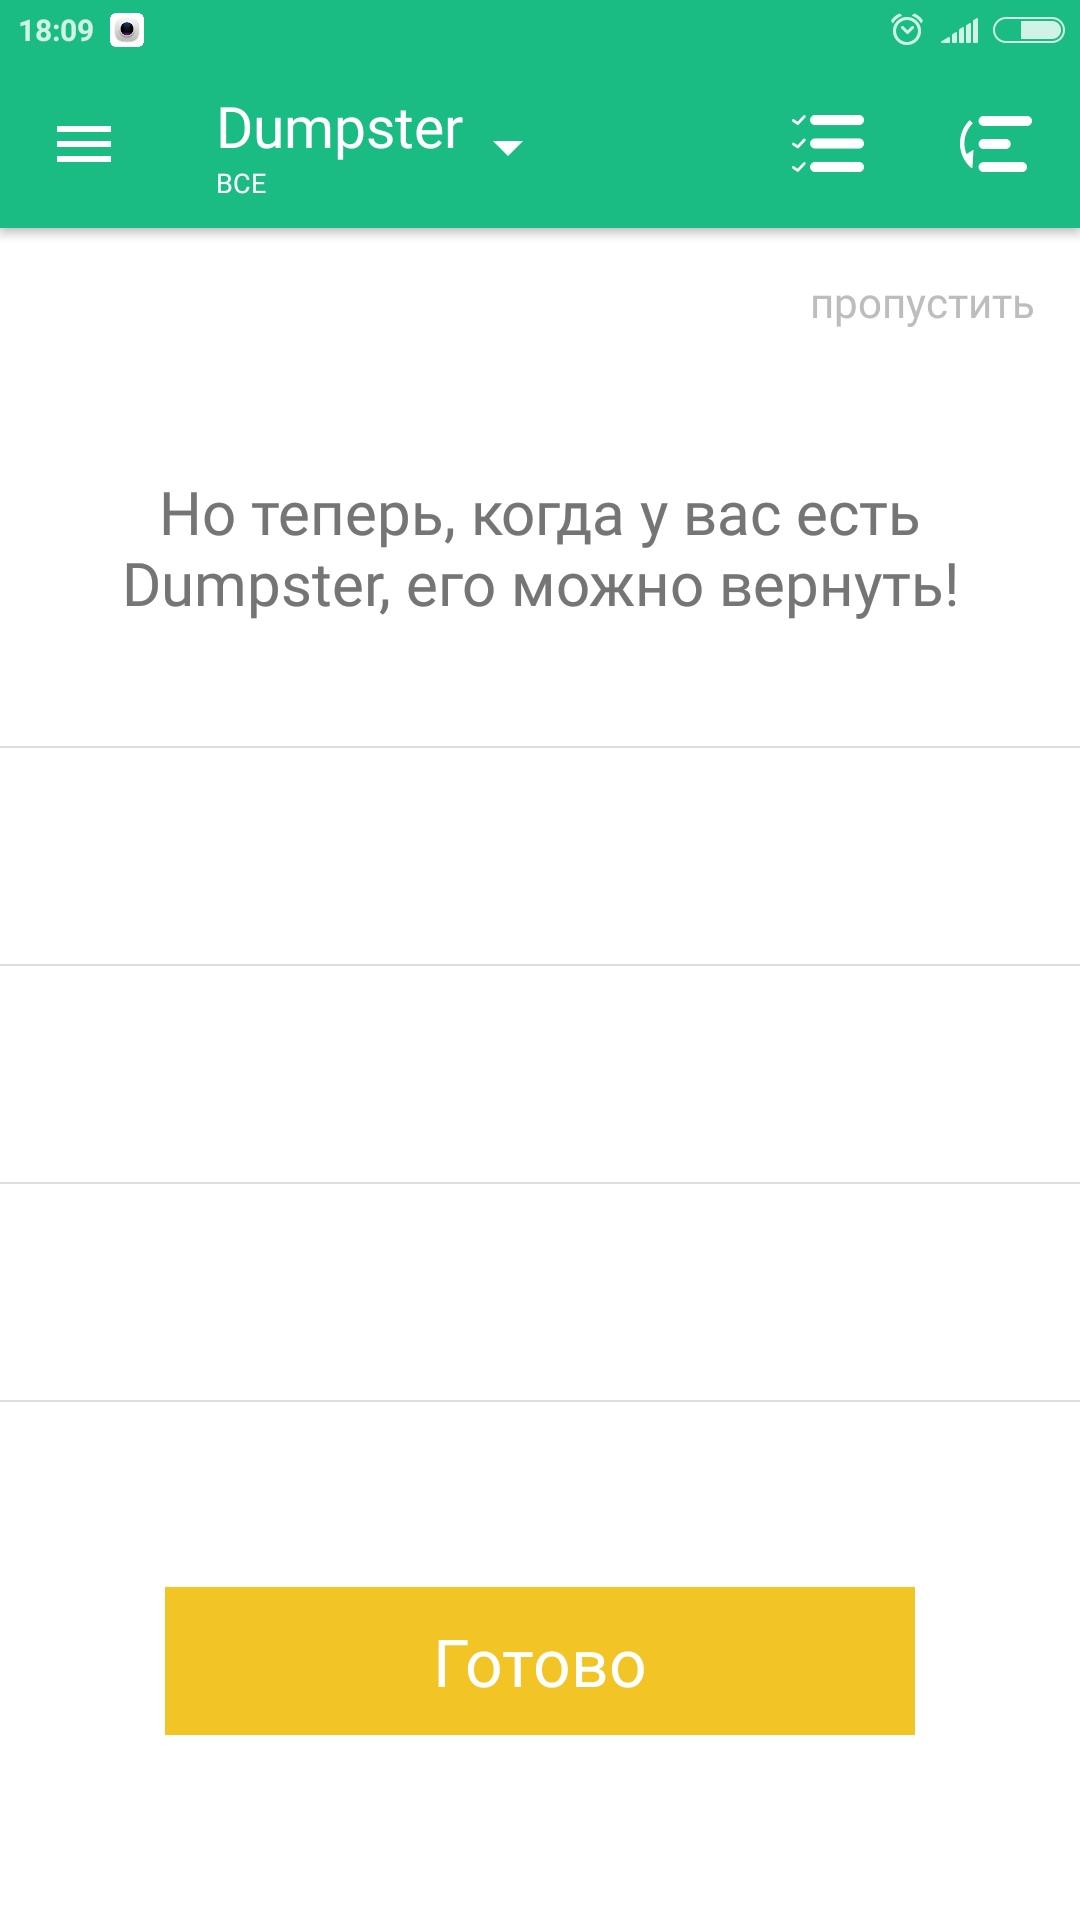 Приложения в Google Play – Контра Сити - …